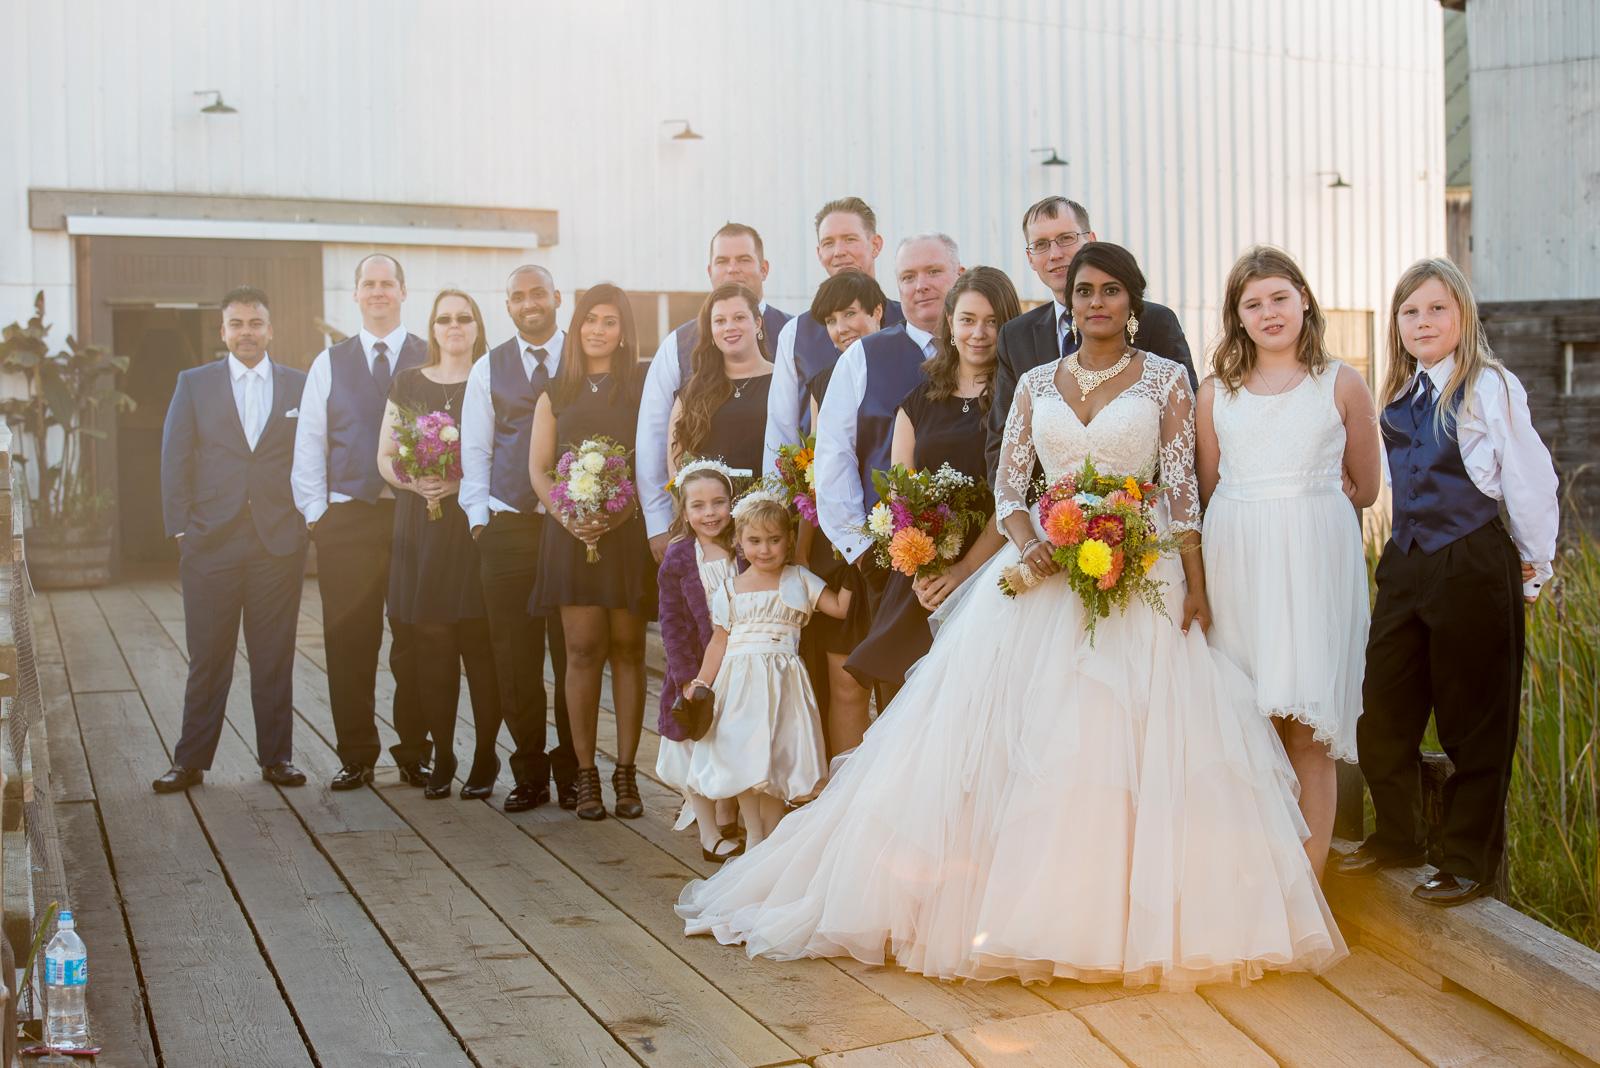 bc-wedding-photographers-paradise-banquet-hall-wedding-19.jpg